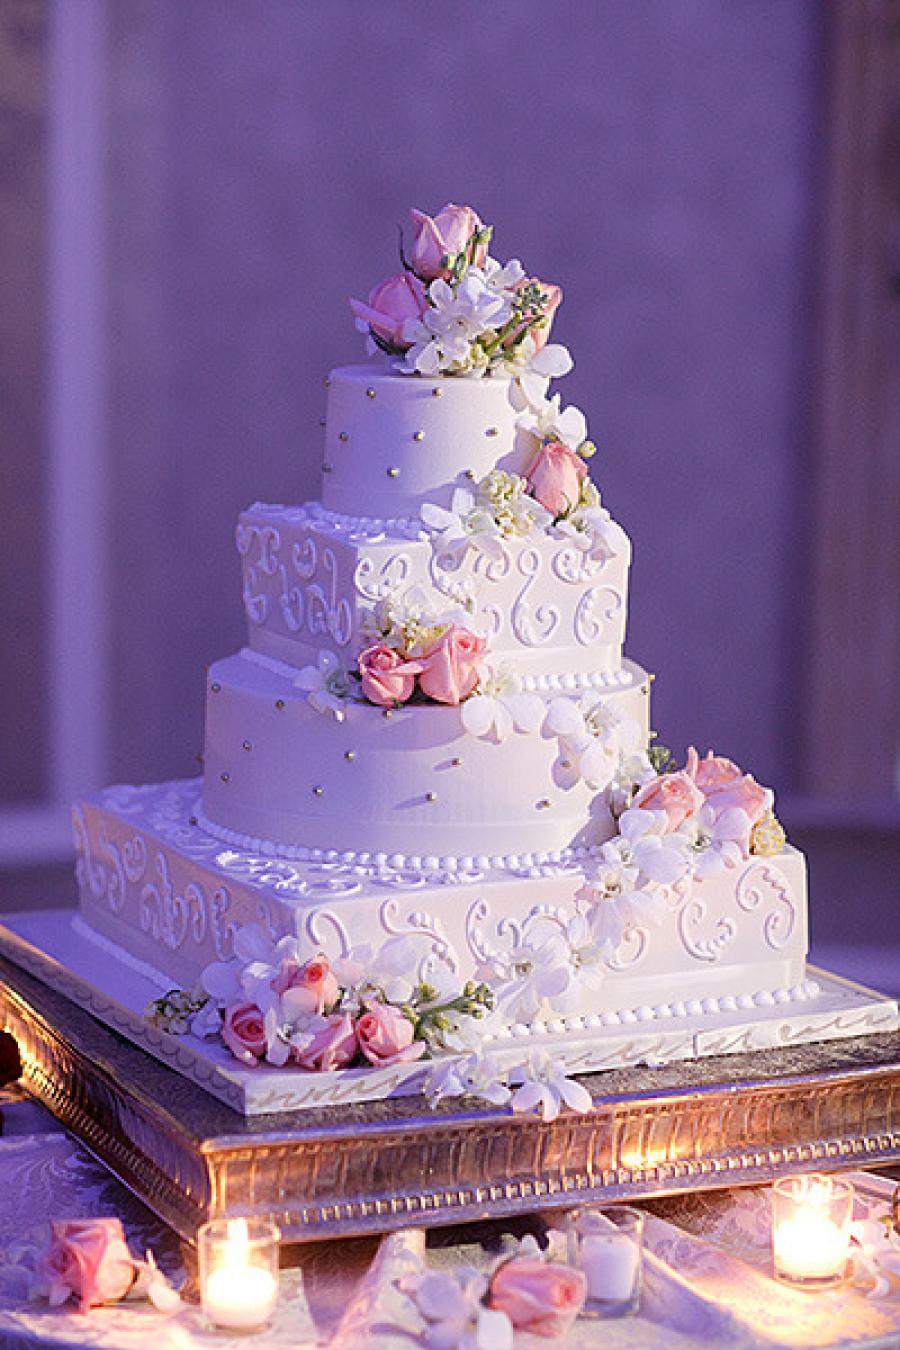 Stunning Wedding Cakes  25 Jaw Dropping Beautiful Wedding Cake Ideas MODwedding